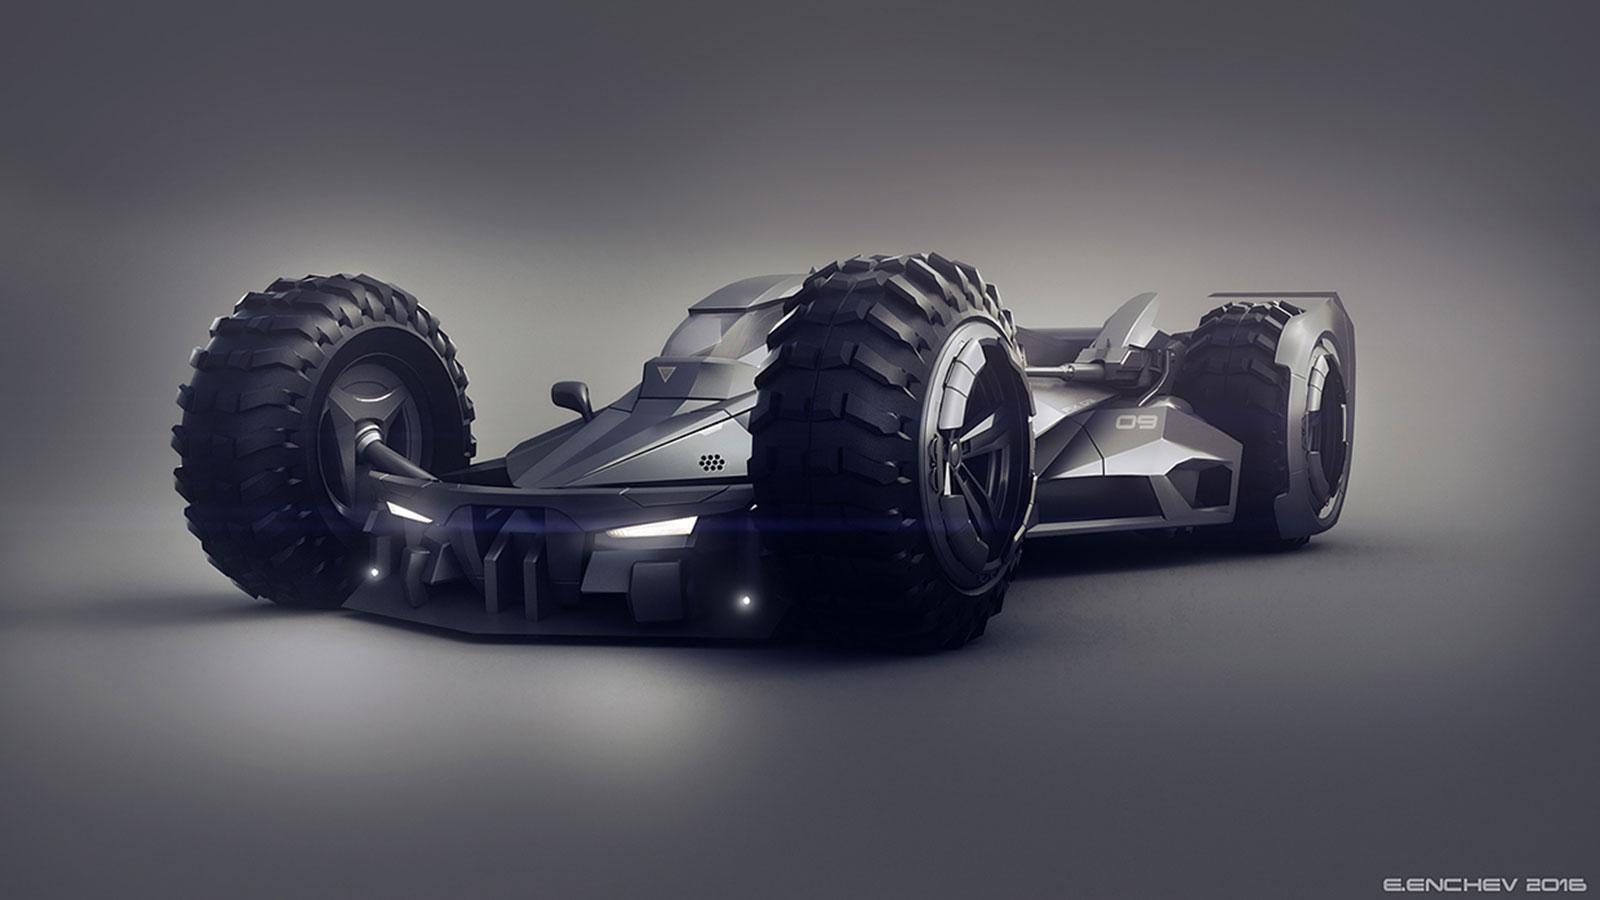 Batmobile-Concept-By-Encho-Enchev-1